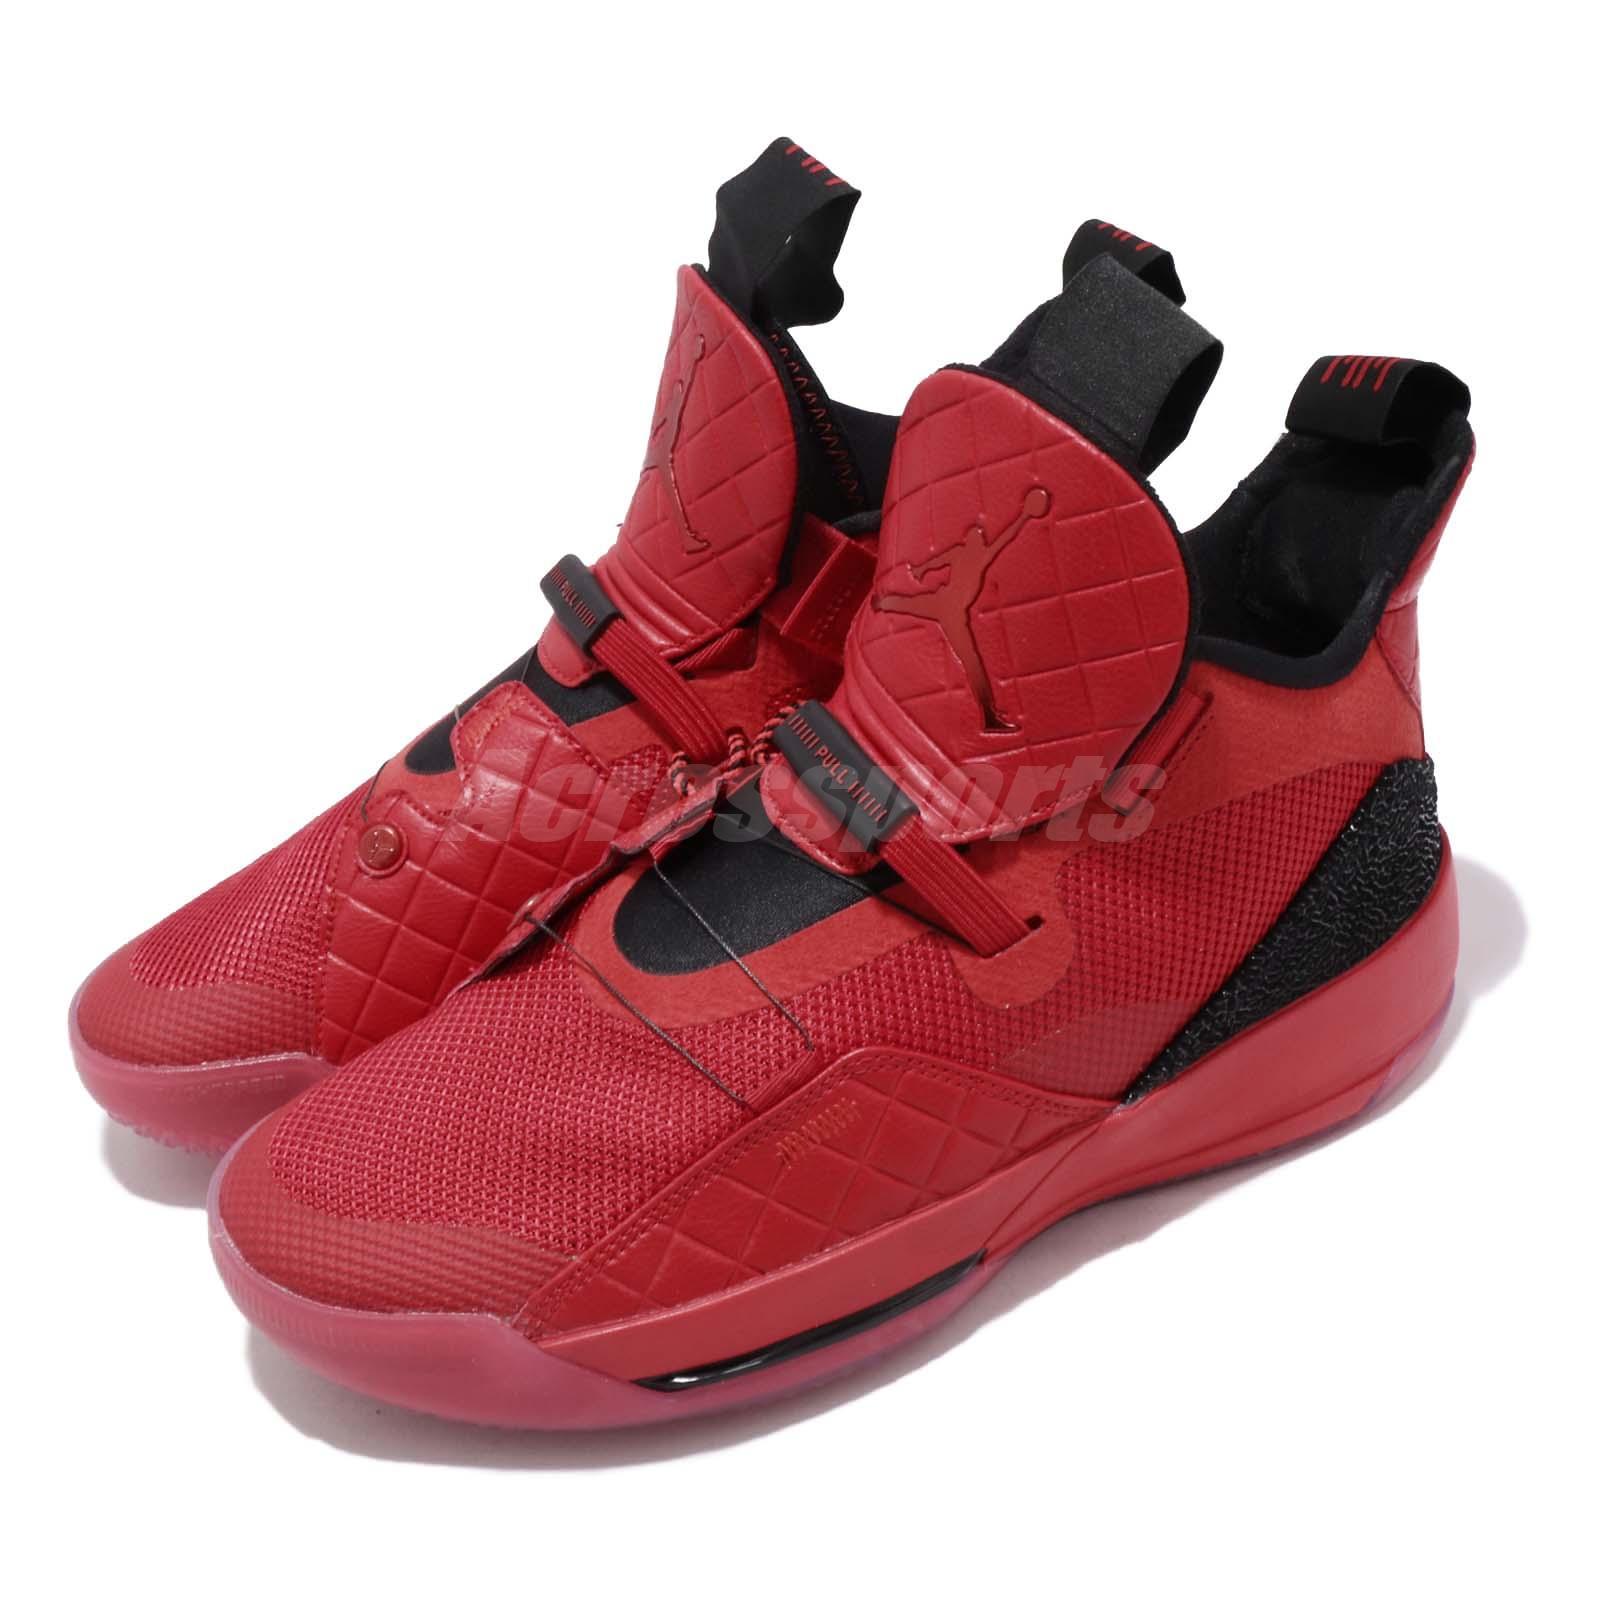 Details about Nike Air Jordan XXXIII PF 33 University Red Black Men Basketball Shoe BV5072 600